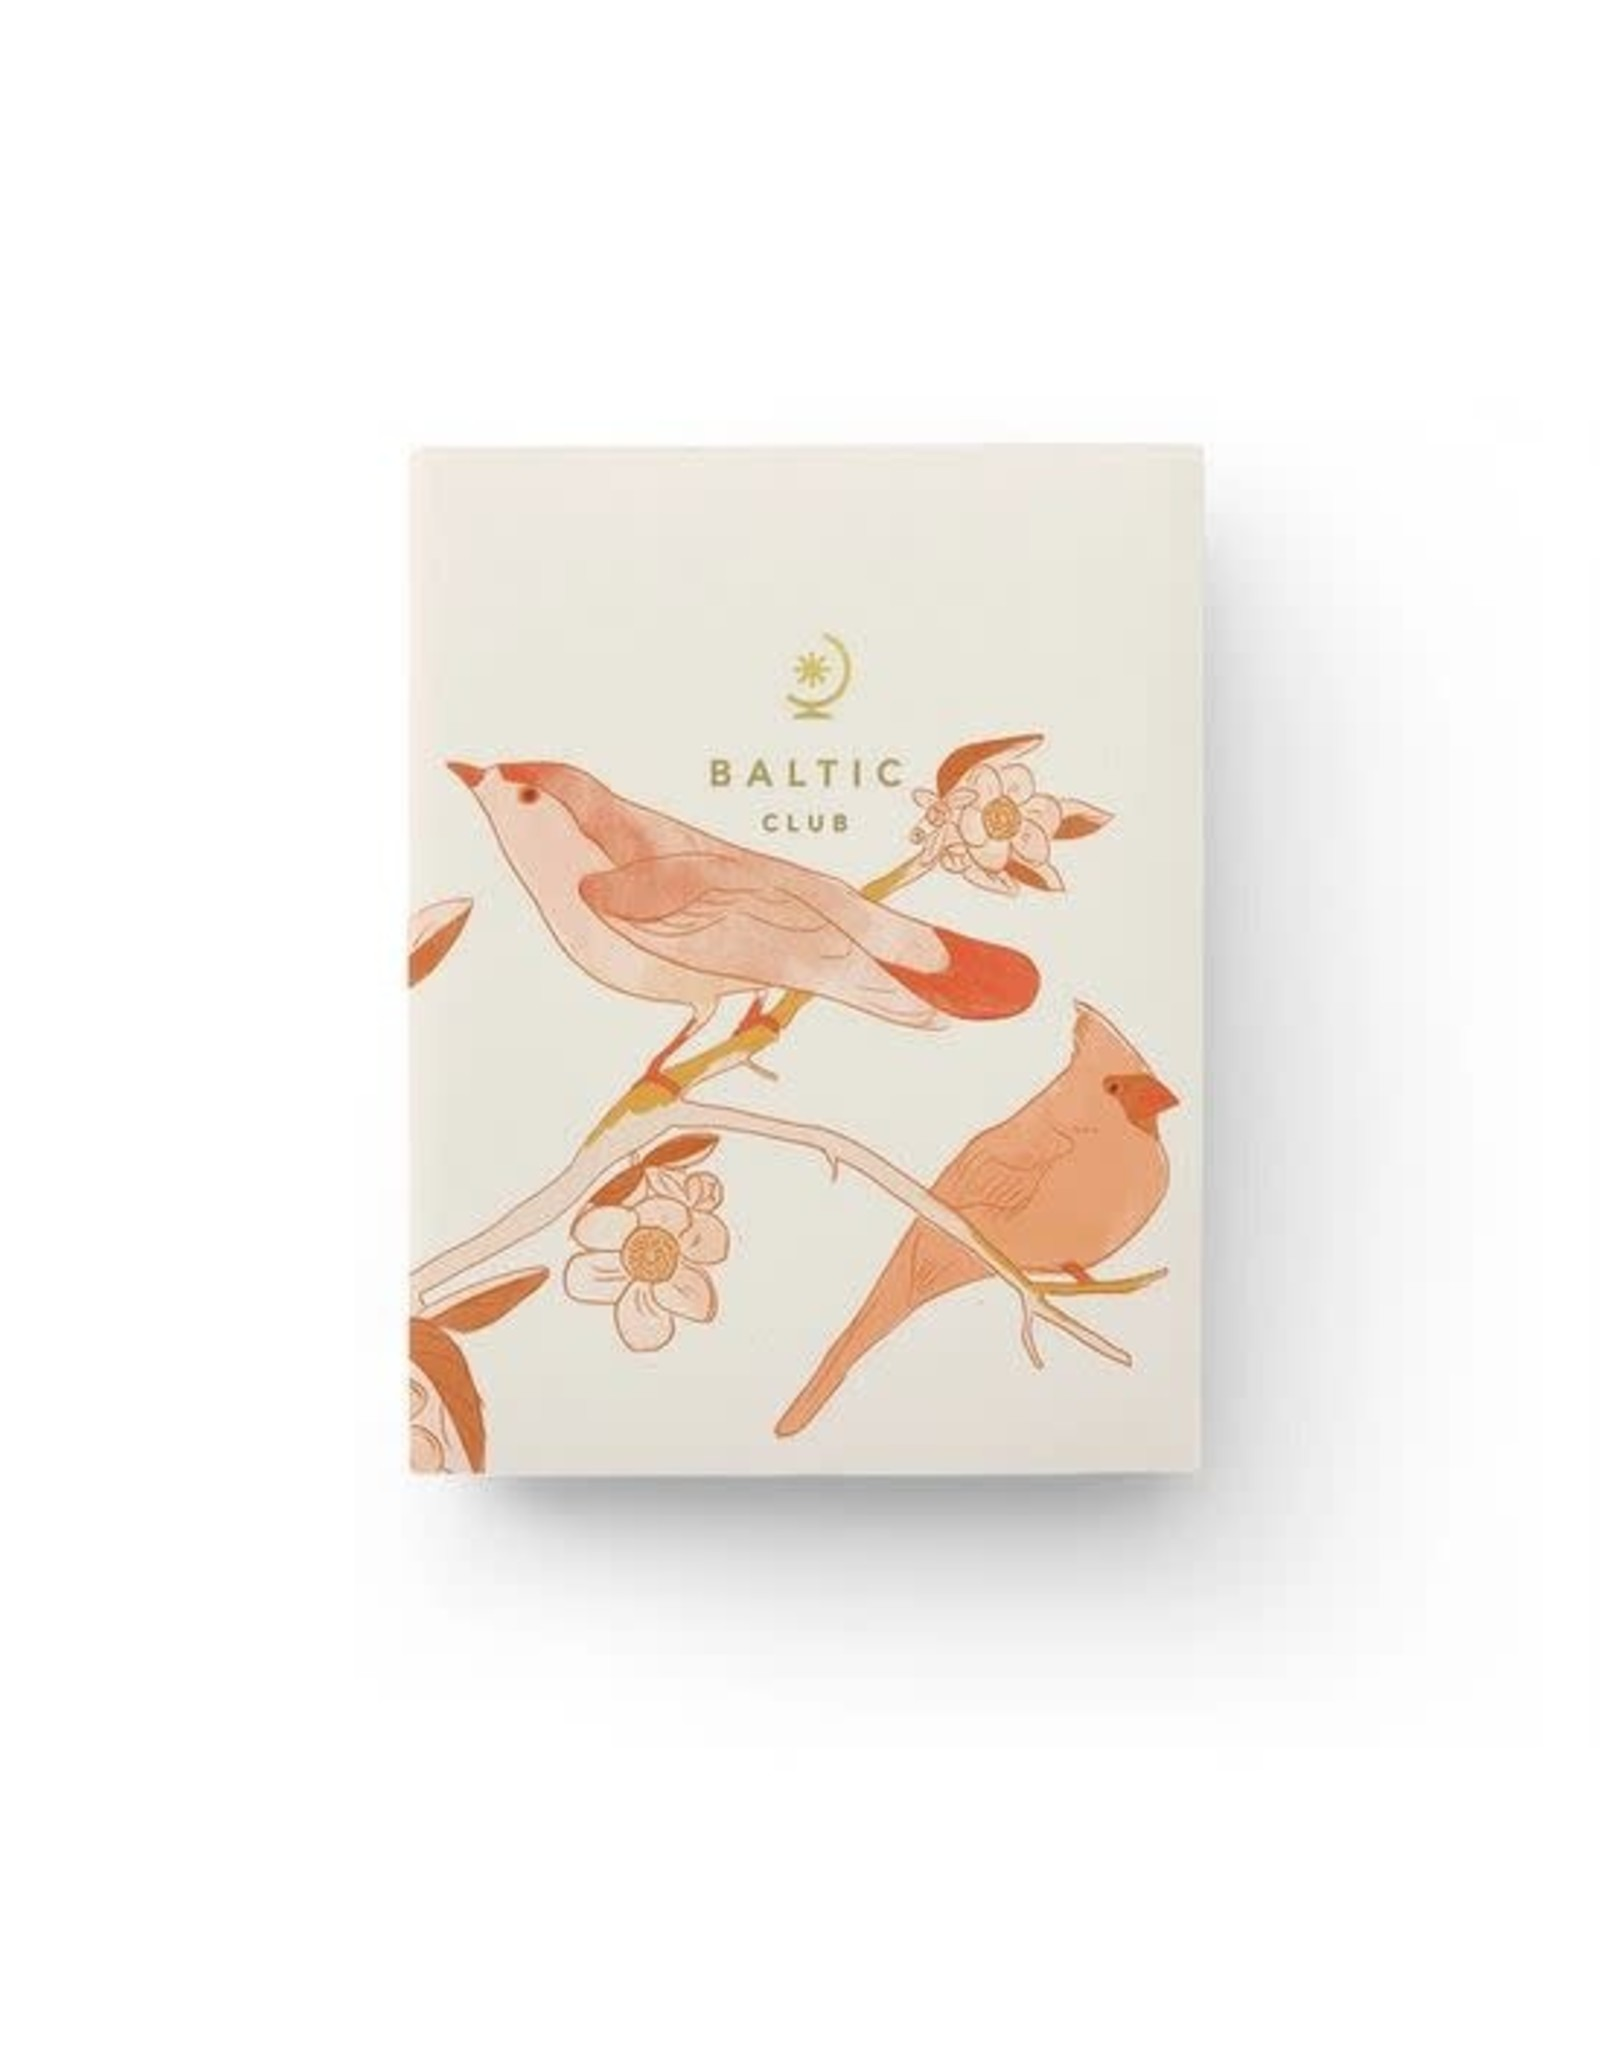 Baltic Club Pocket Notebook - Birds